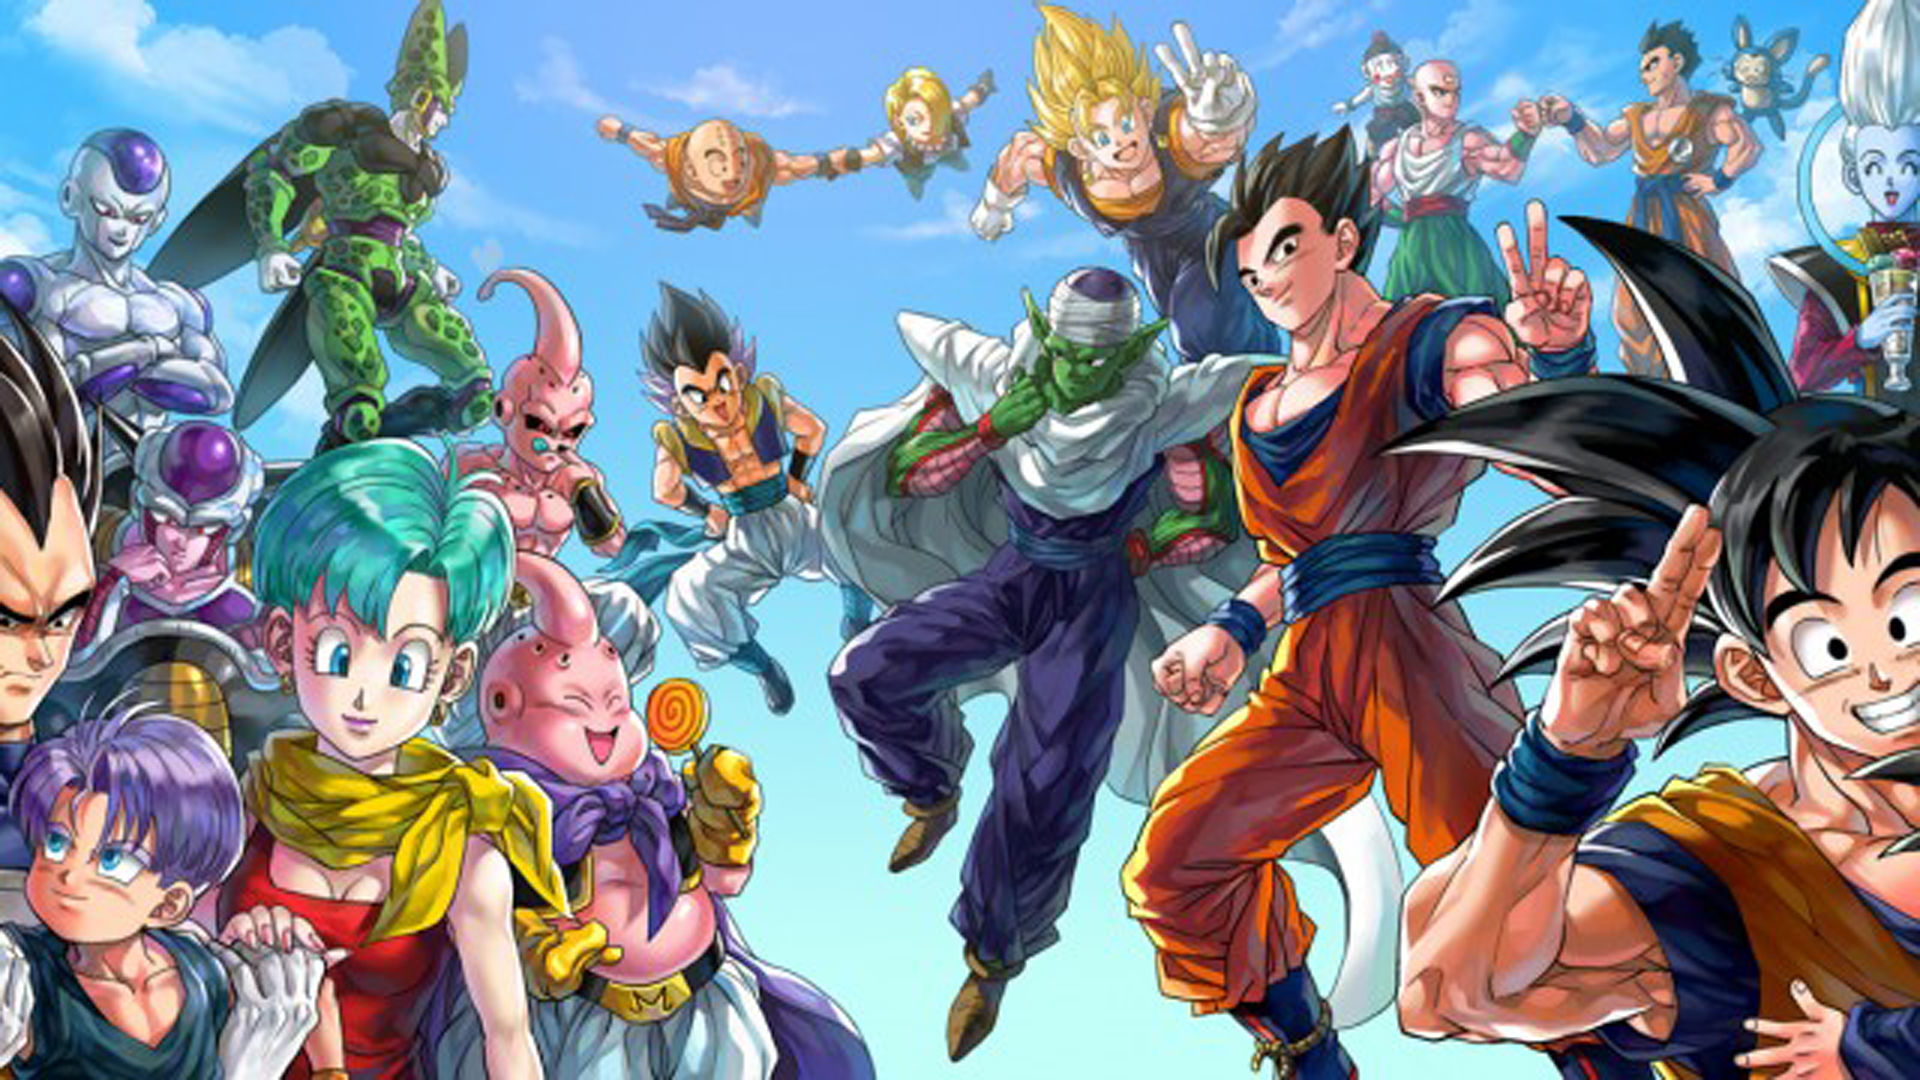 Dragon-Ball-Z-Extreme-Budoten